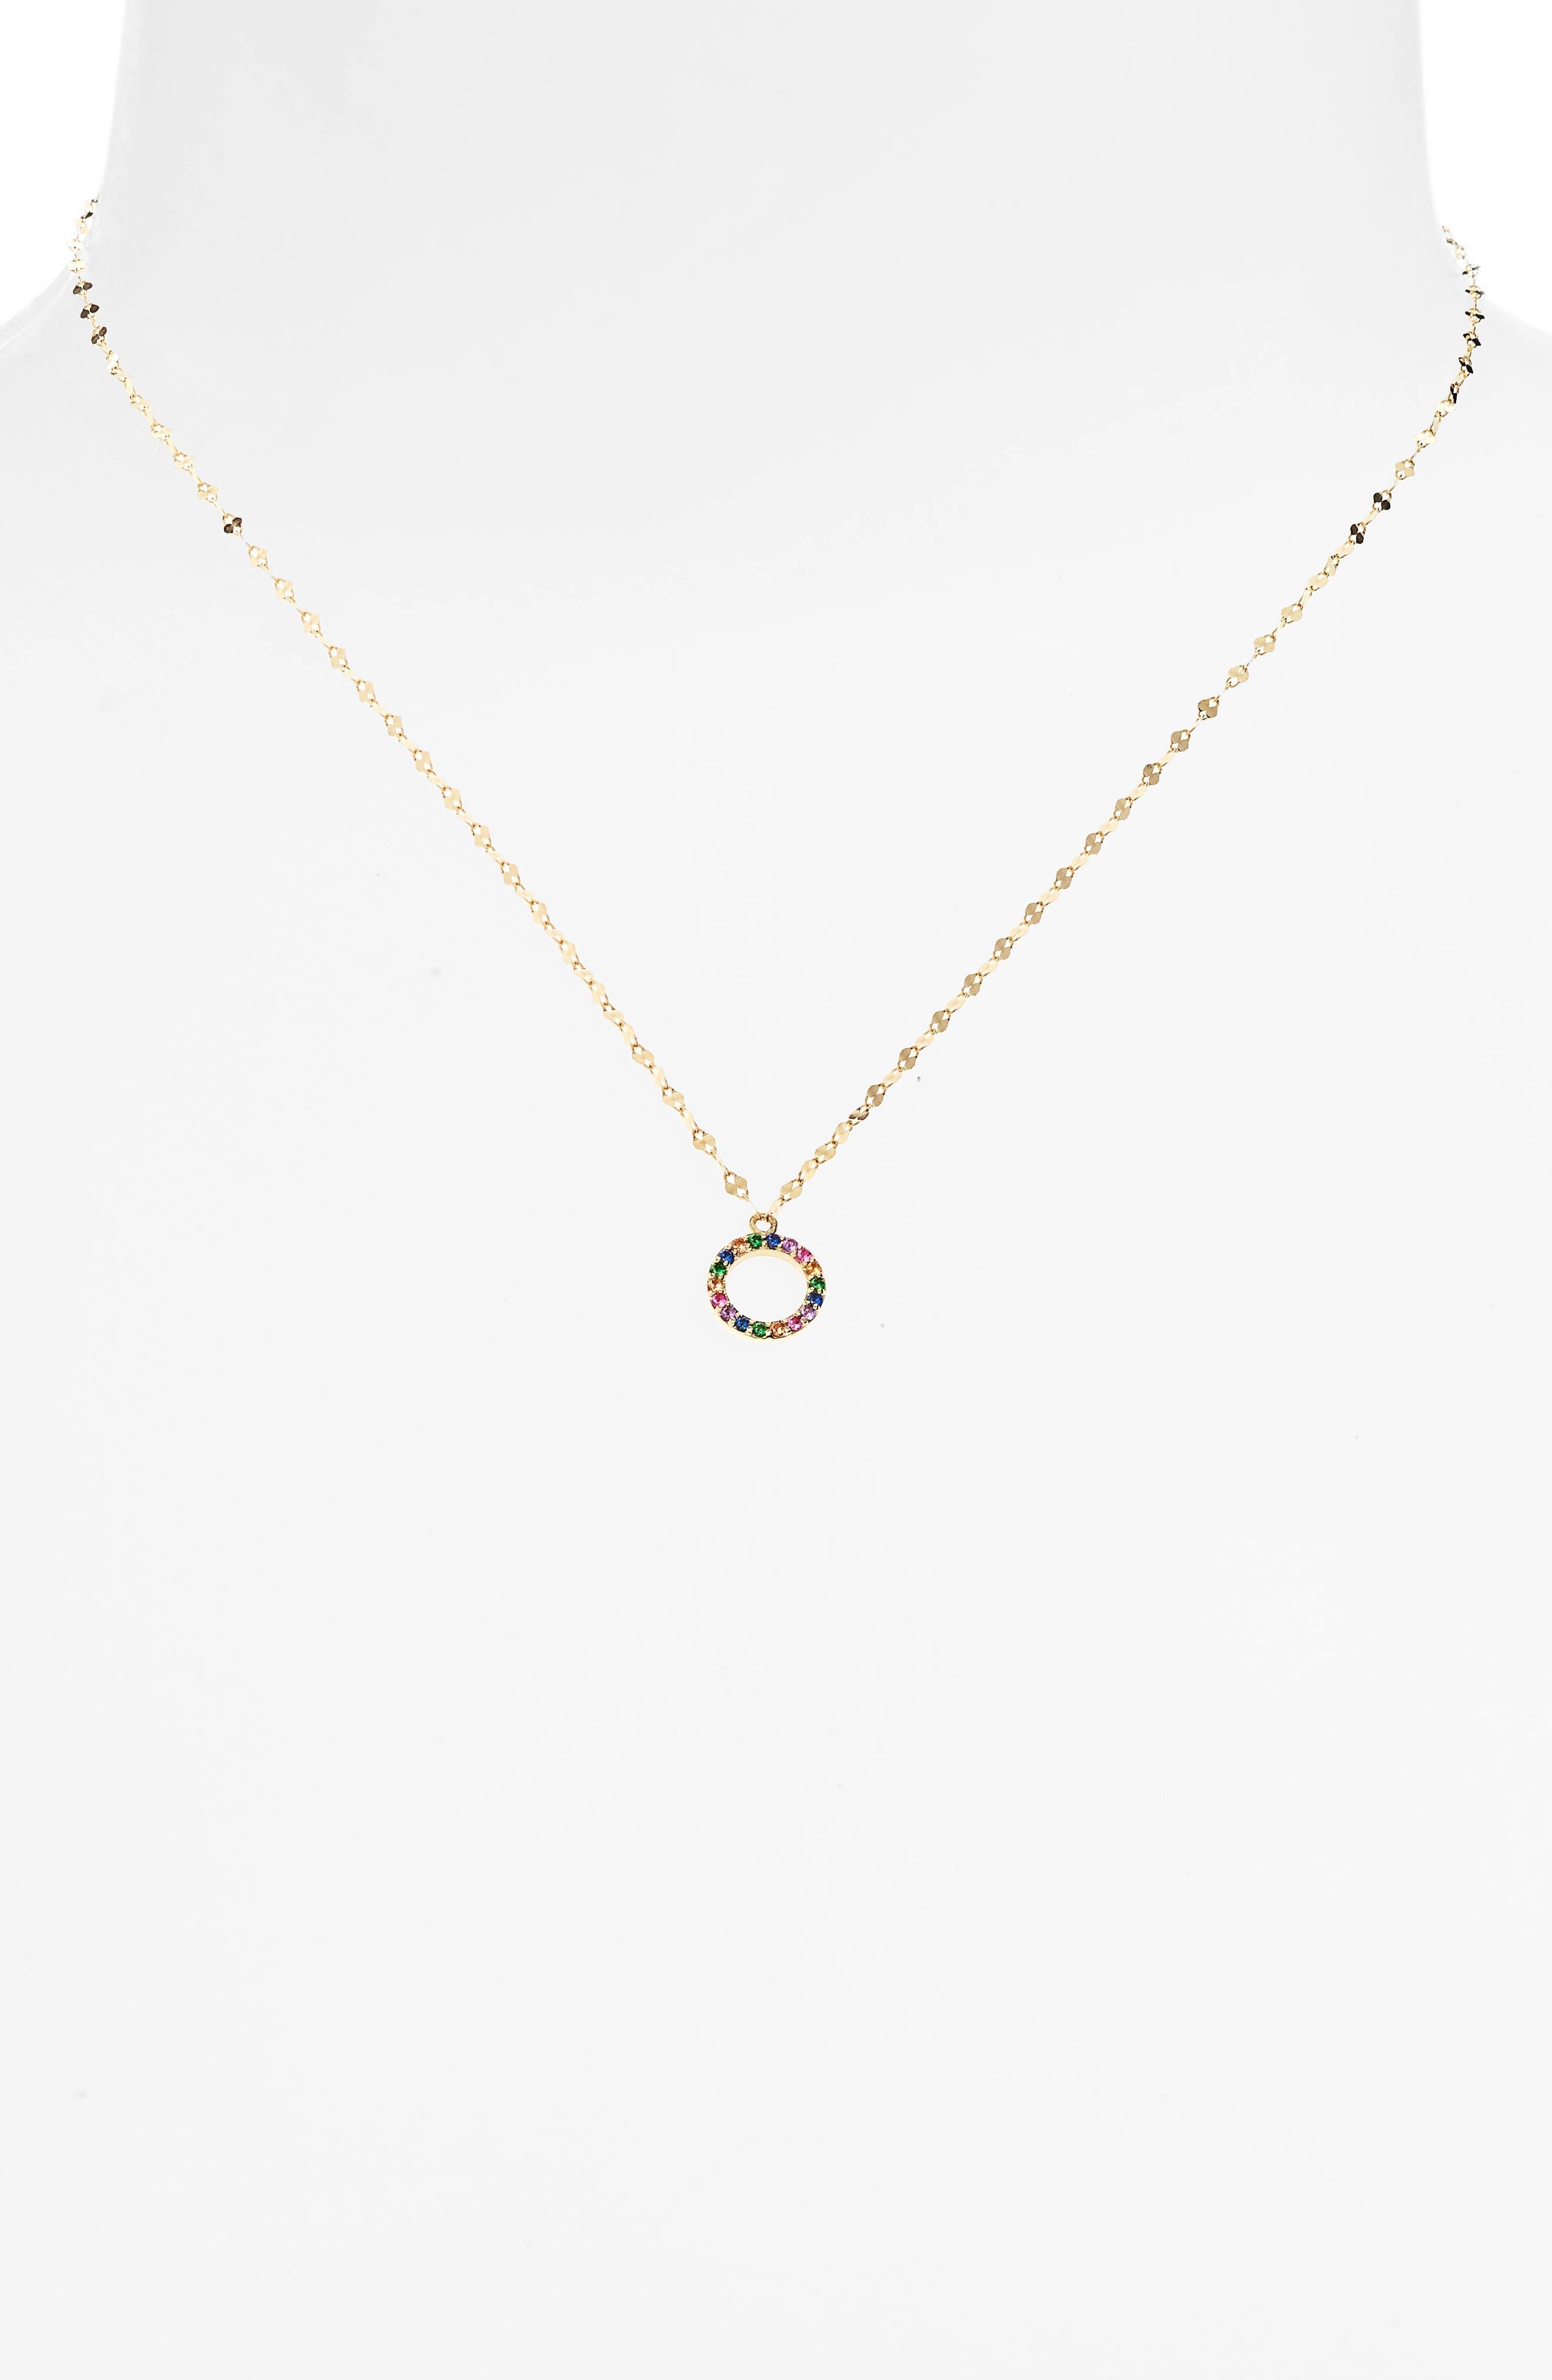 Mini Circle Sapphire Pendant Necklace,                             Alternate thumbnail 2, color,                             710